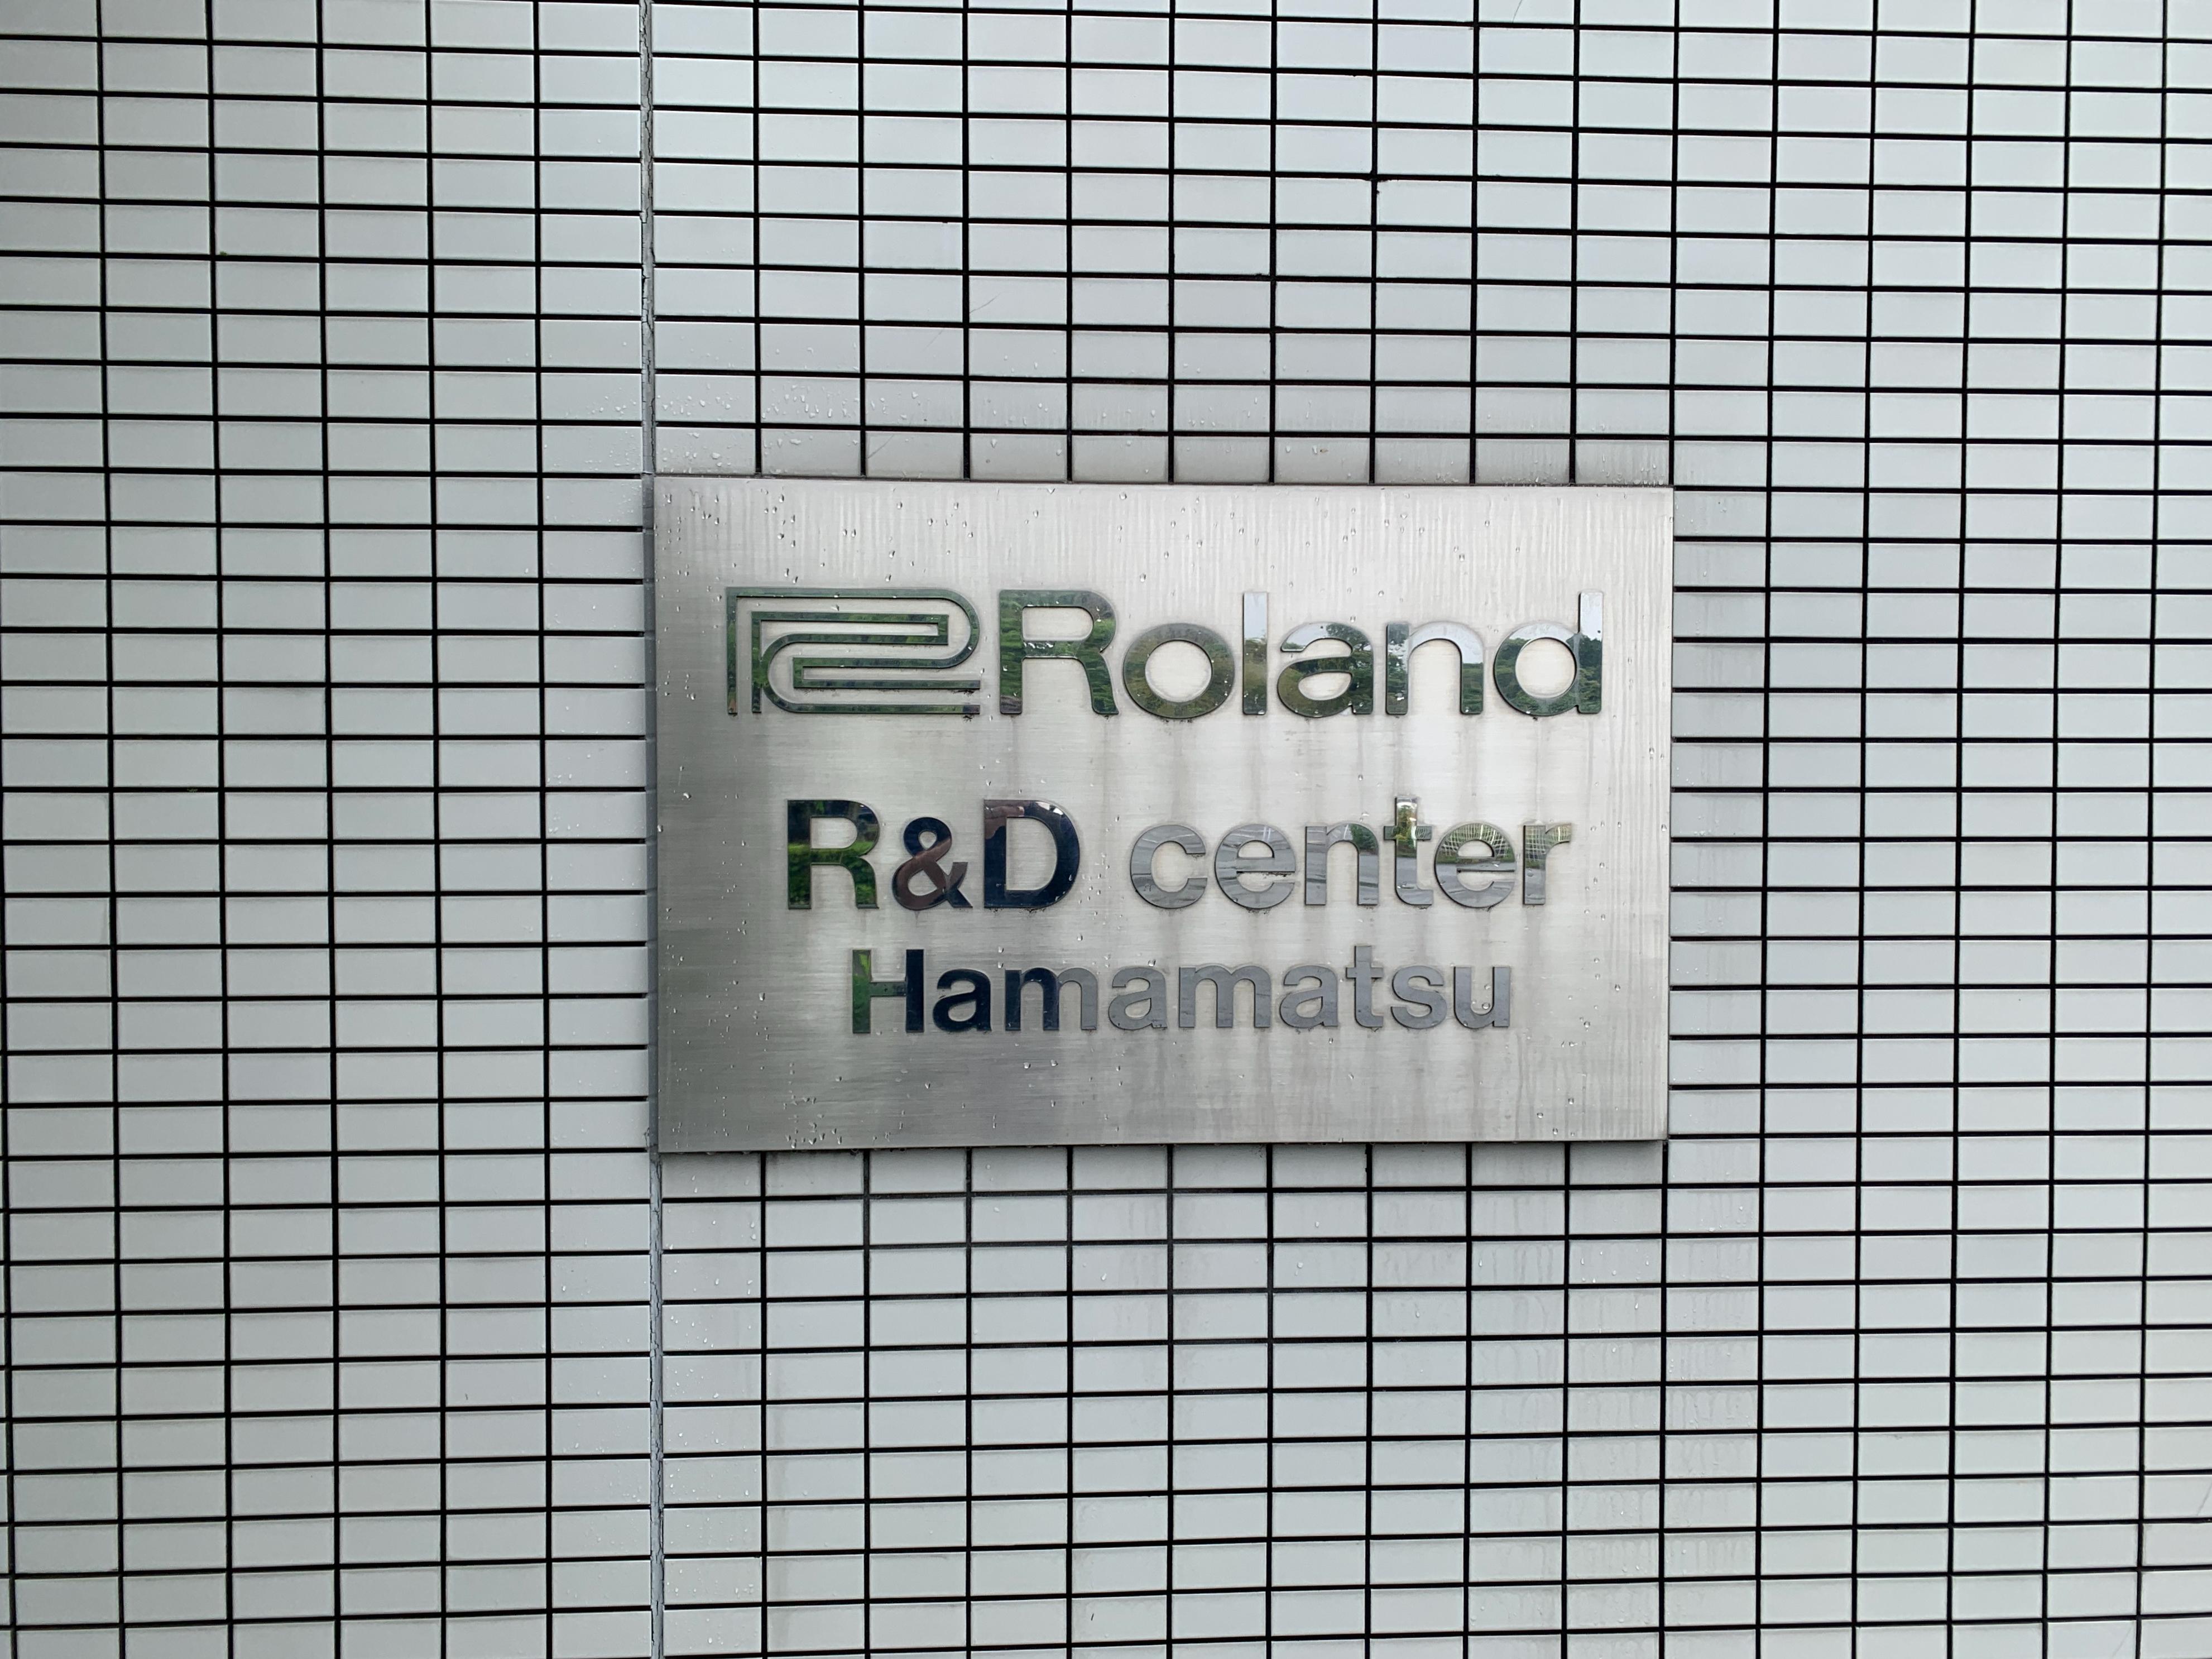 Roland R&D Center